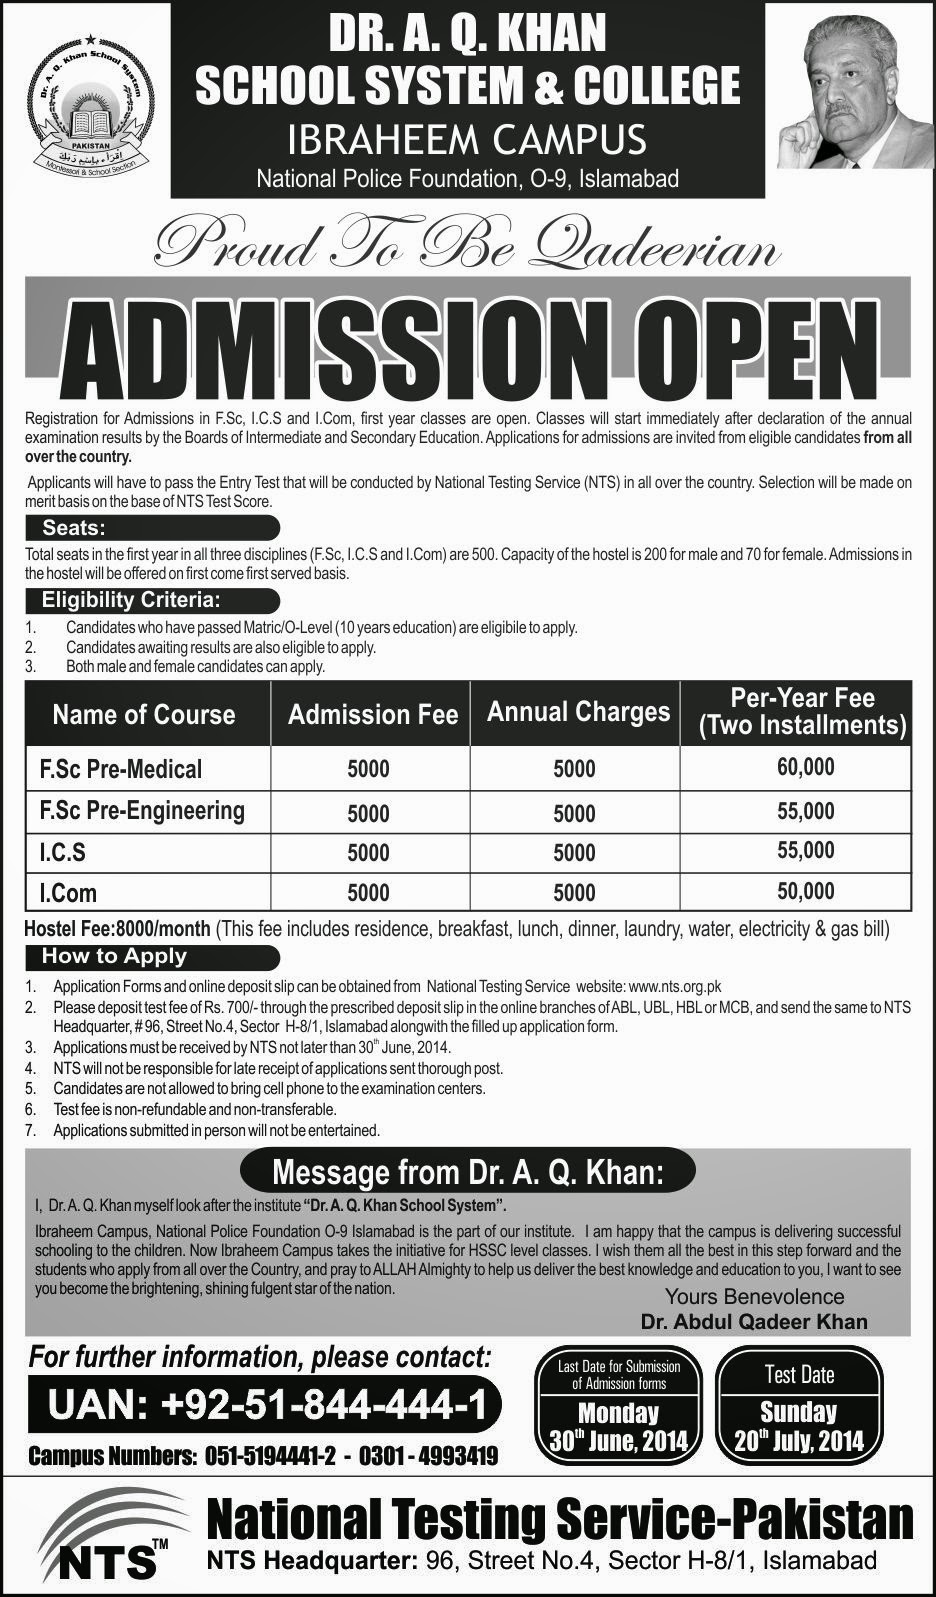 Dr AQ Khan School System College Ibraheem Campus Islamabad